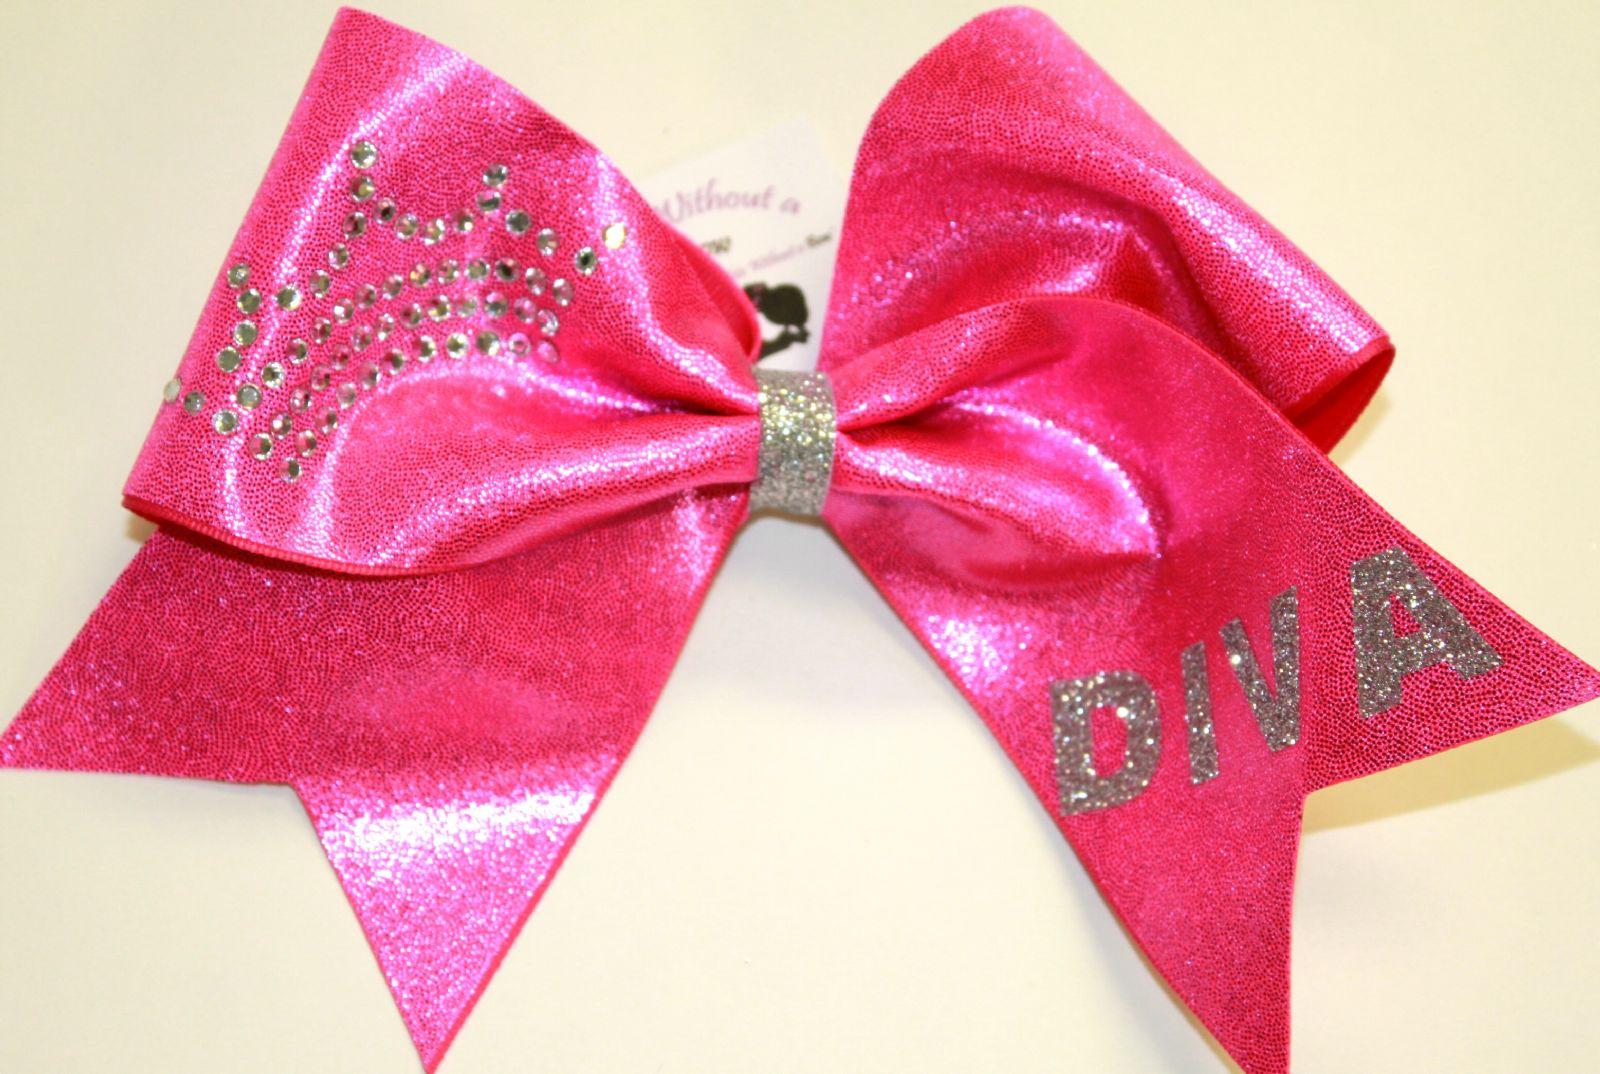 Got bows quotes quotesgram - Cute cheer bows ...